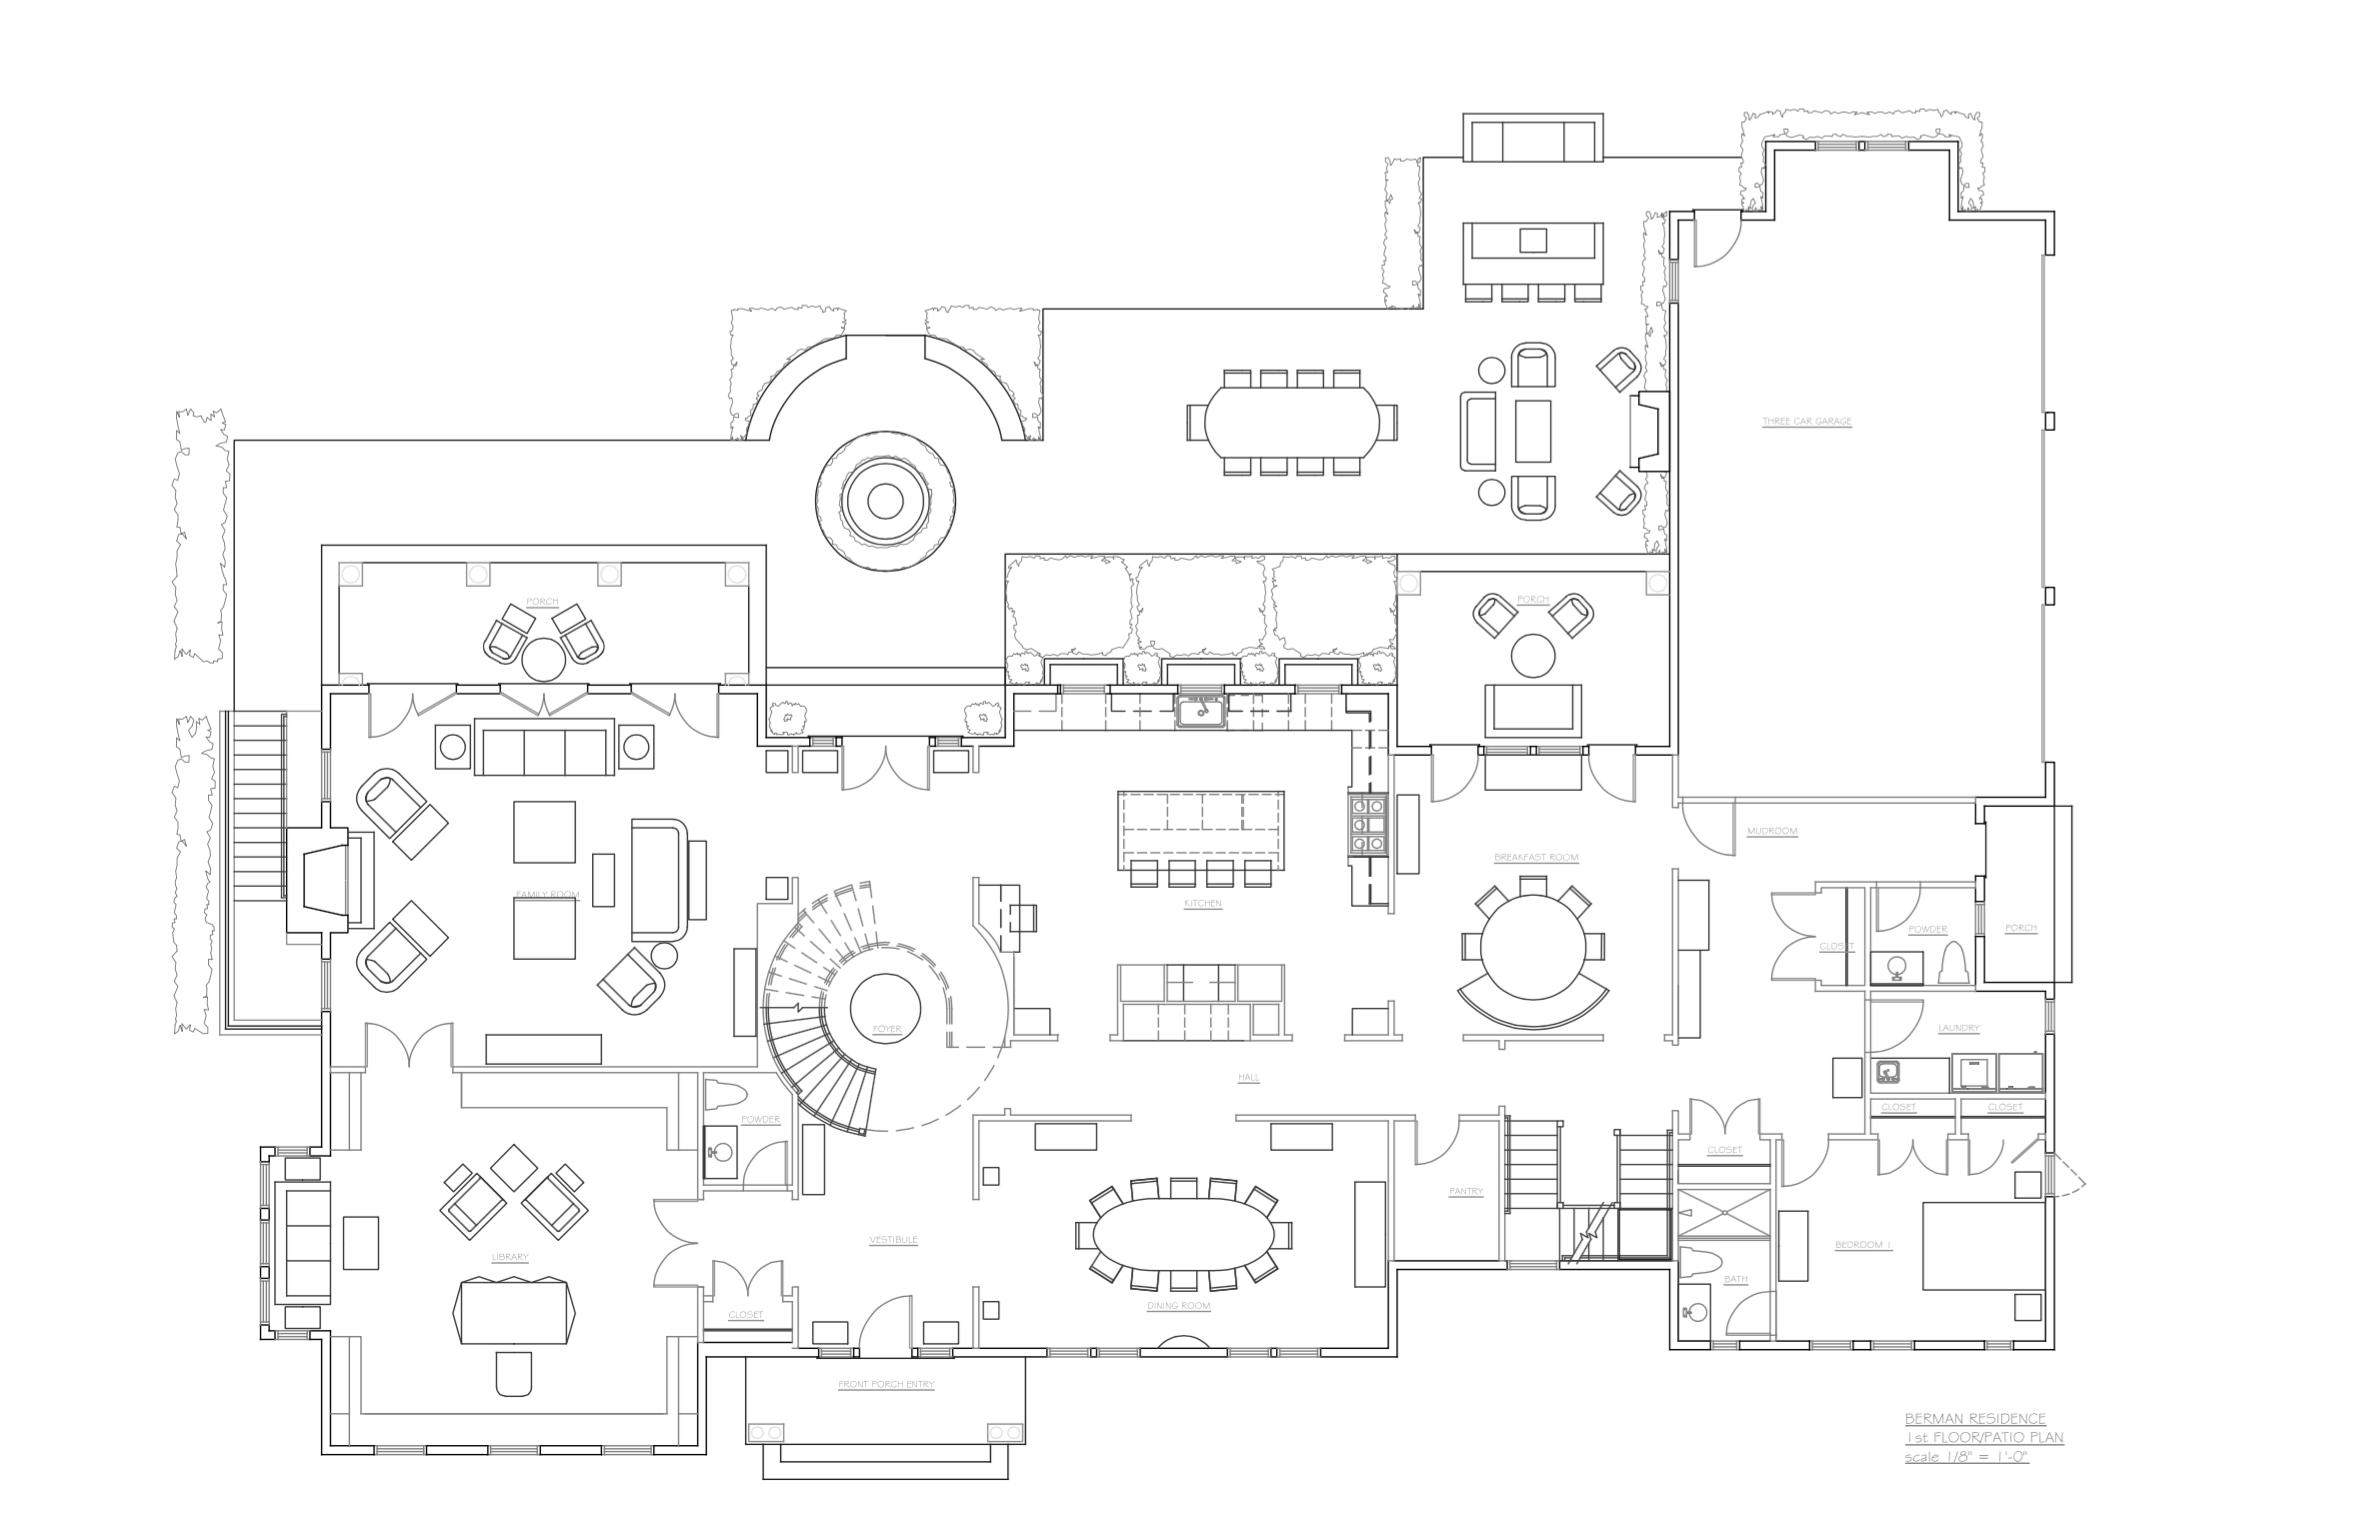 berman floor plan first.png